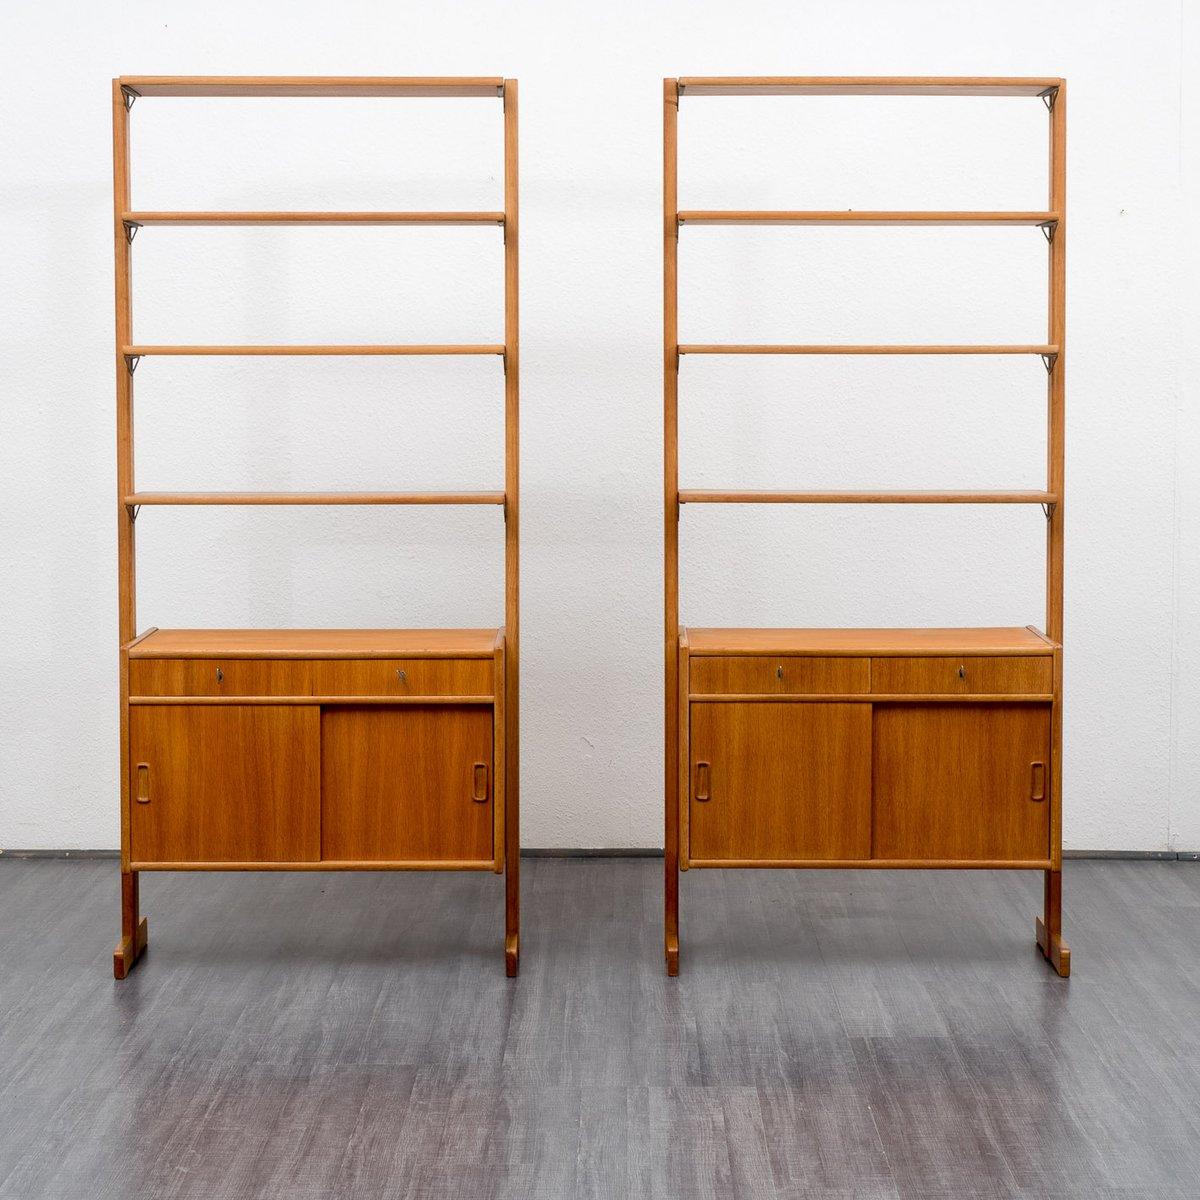 free standing oak shelving unit 1960s for sale at pamono. Black Bedroom Furniture Sets. Home Design Ideas